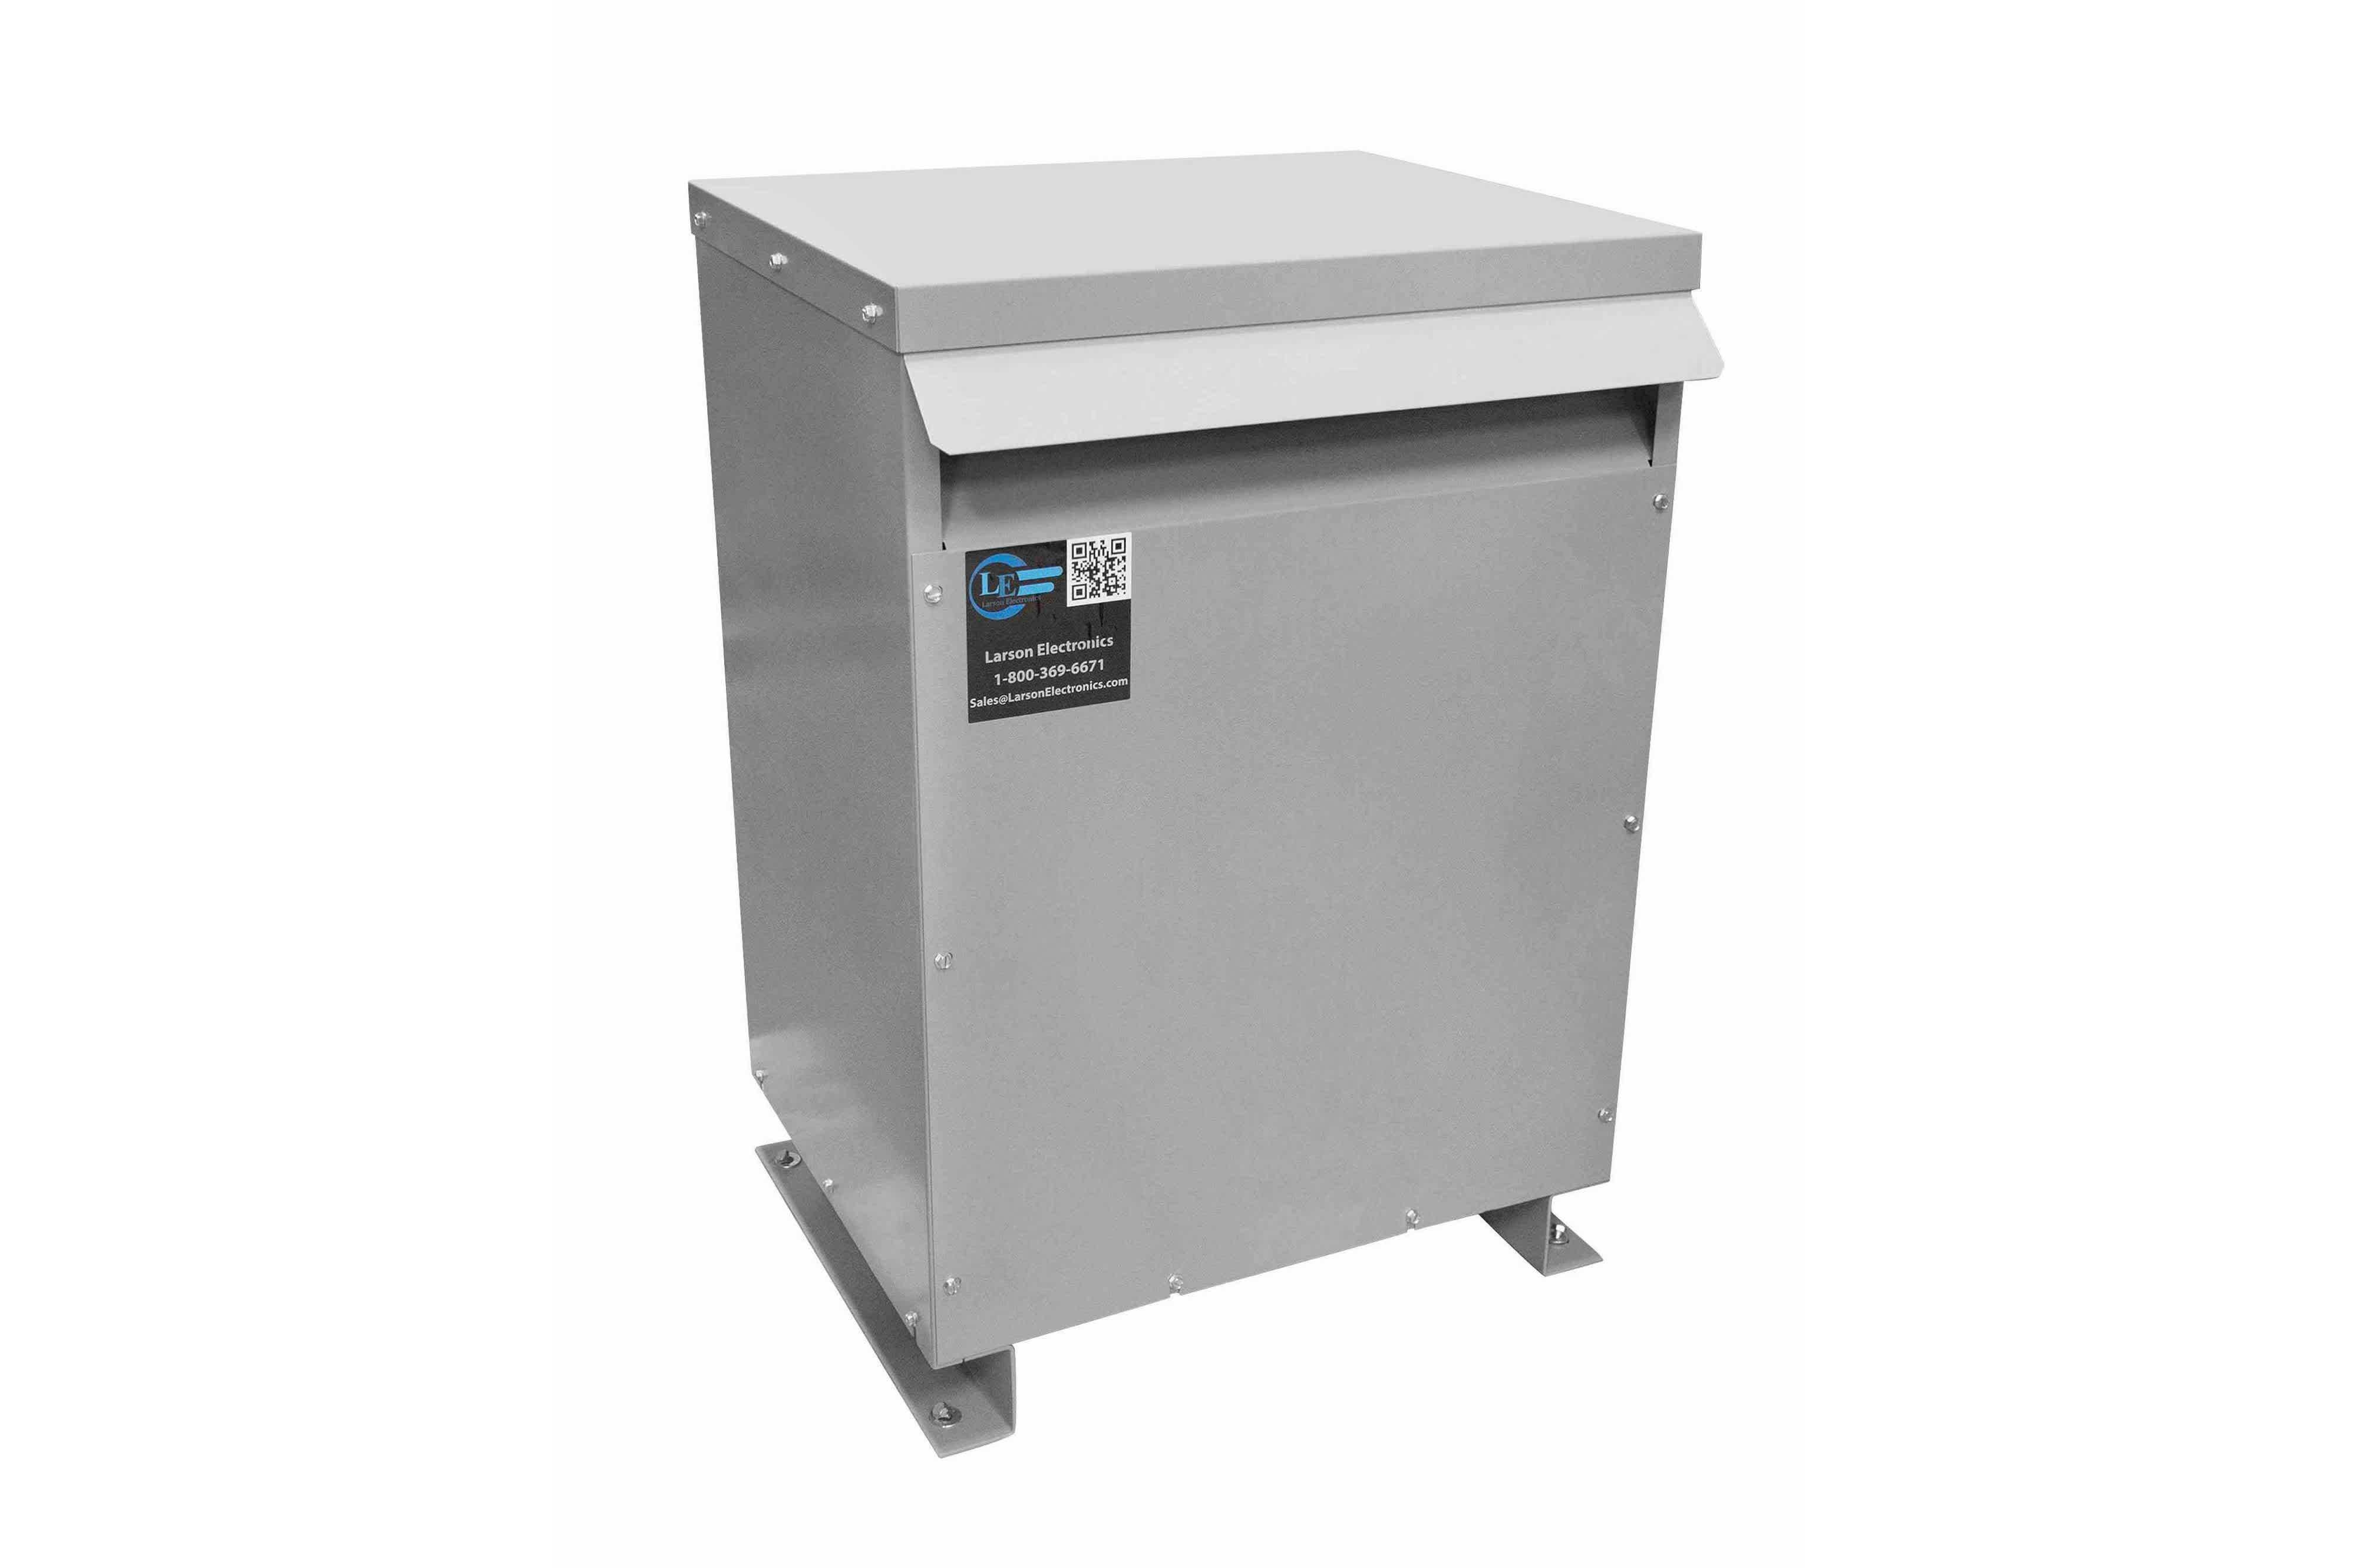 150 kVA 3PH Isolation Transformer, 440V Wye Primary, 208Y/120 Wye-N Secondary, N3R, Ventilated, 60 Hz